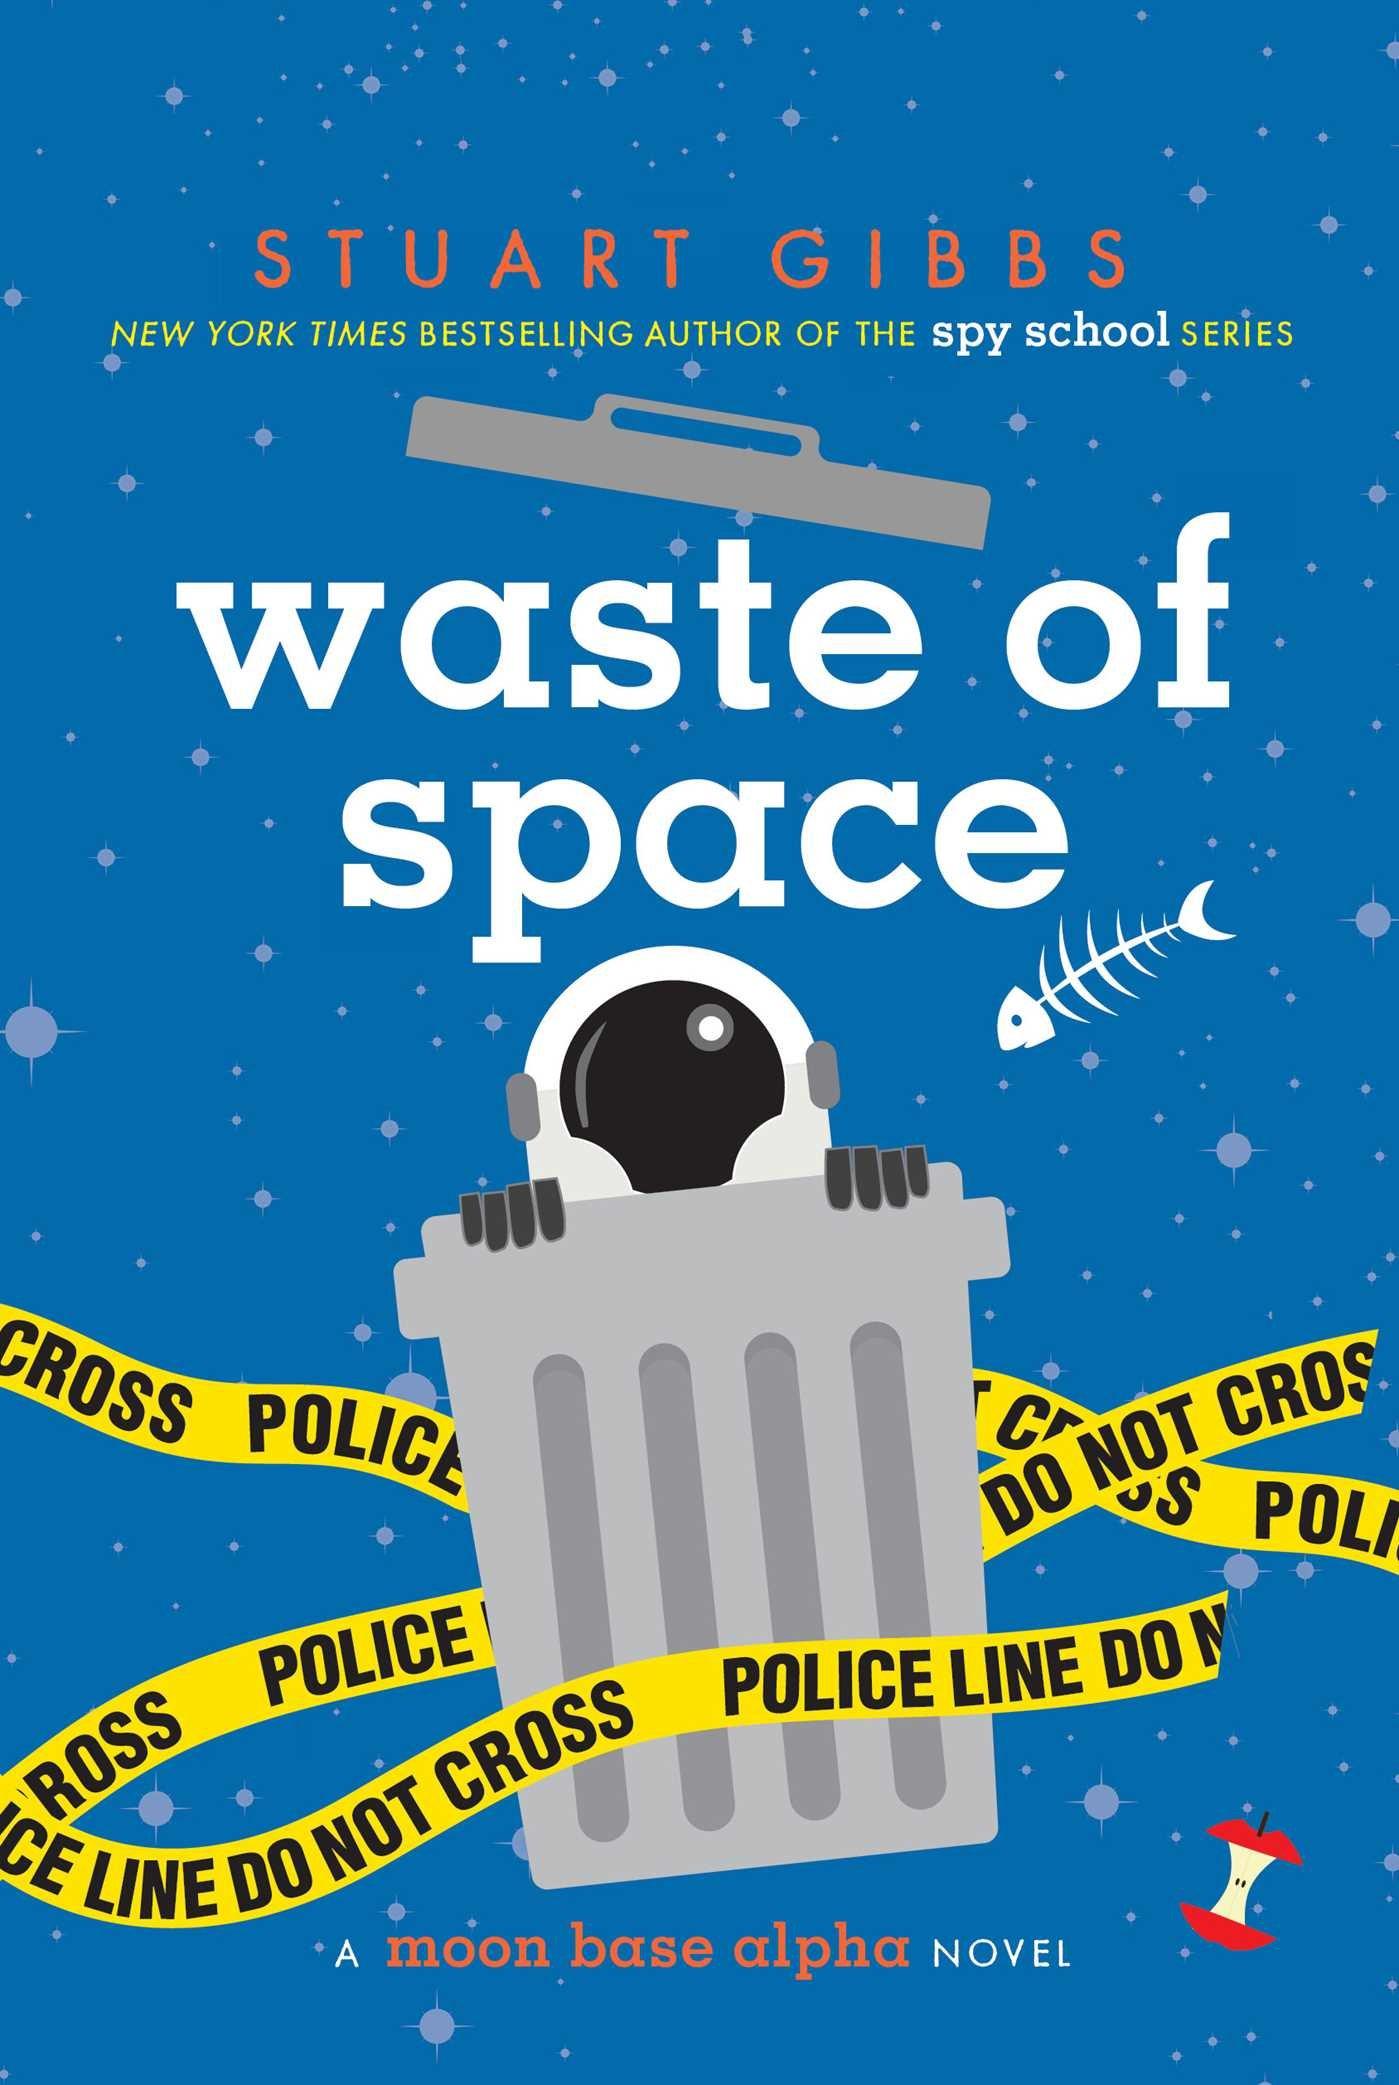 gibbs-waste-space.jpg